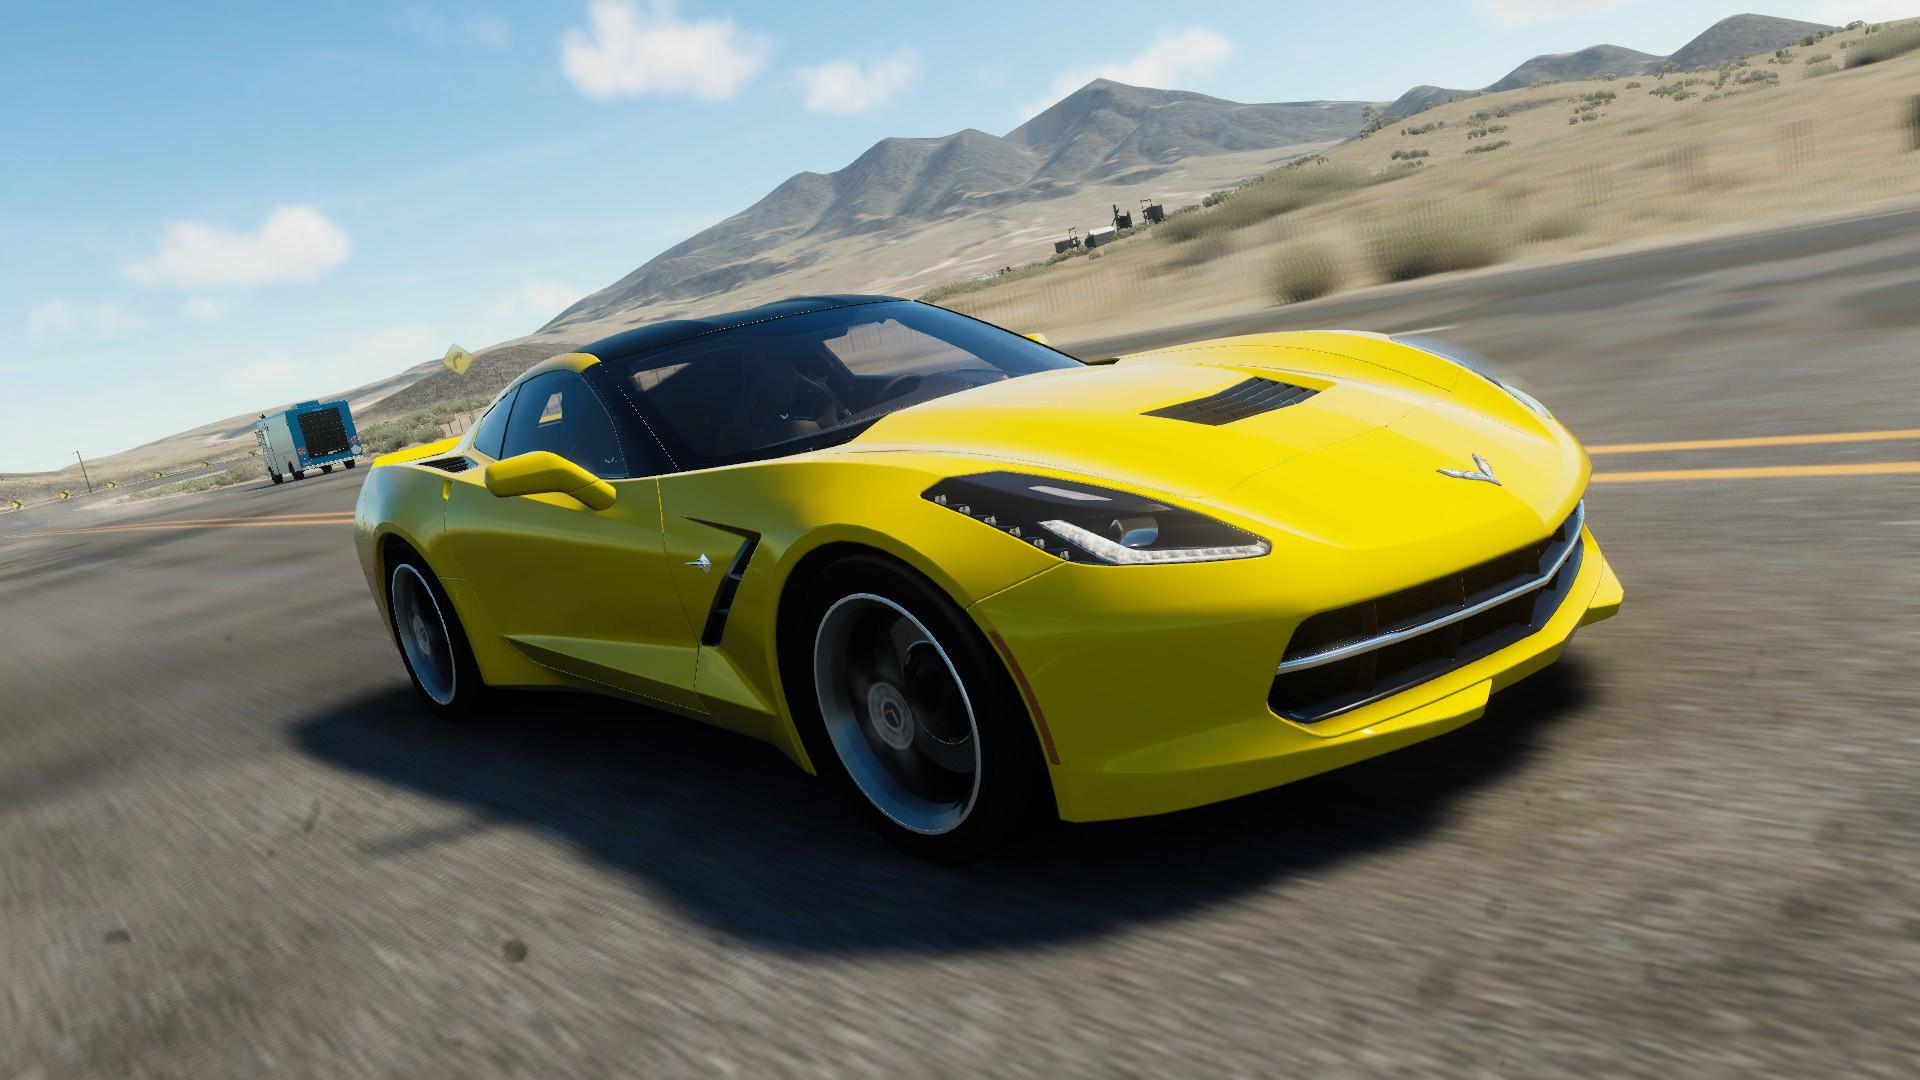 2014 Chevrolet Corvette Stingray THE CREW Wiki